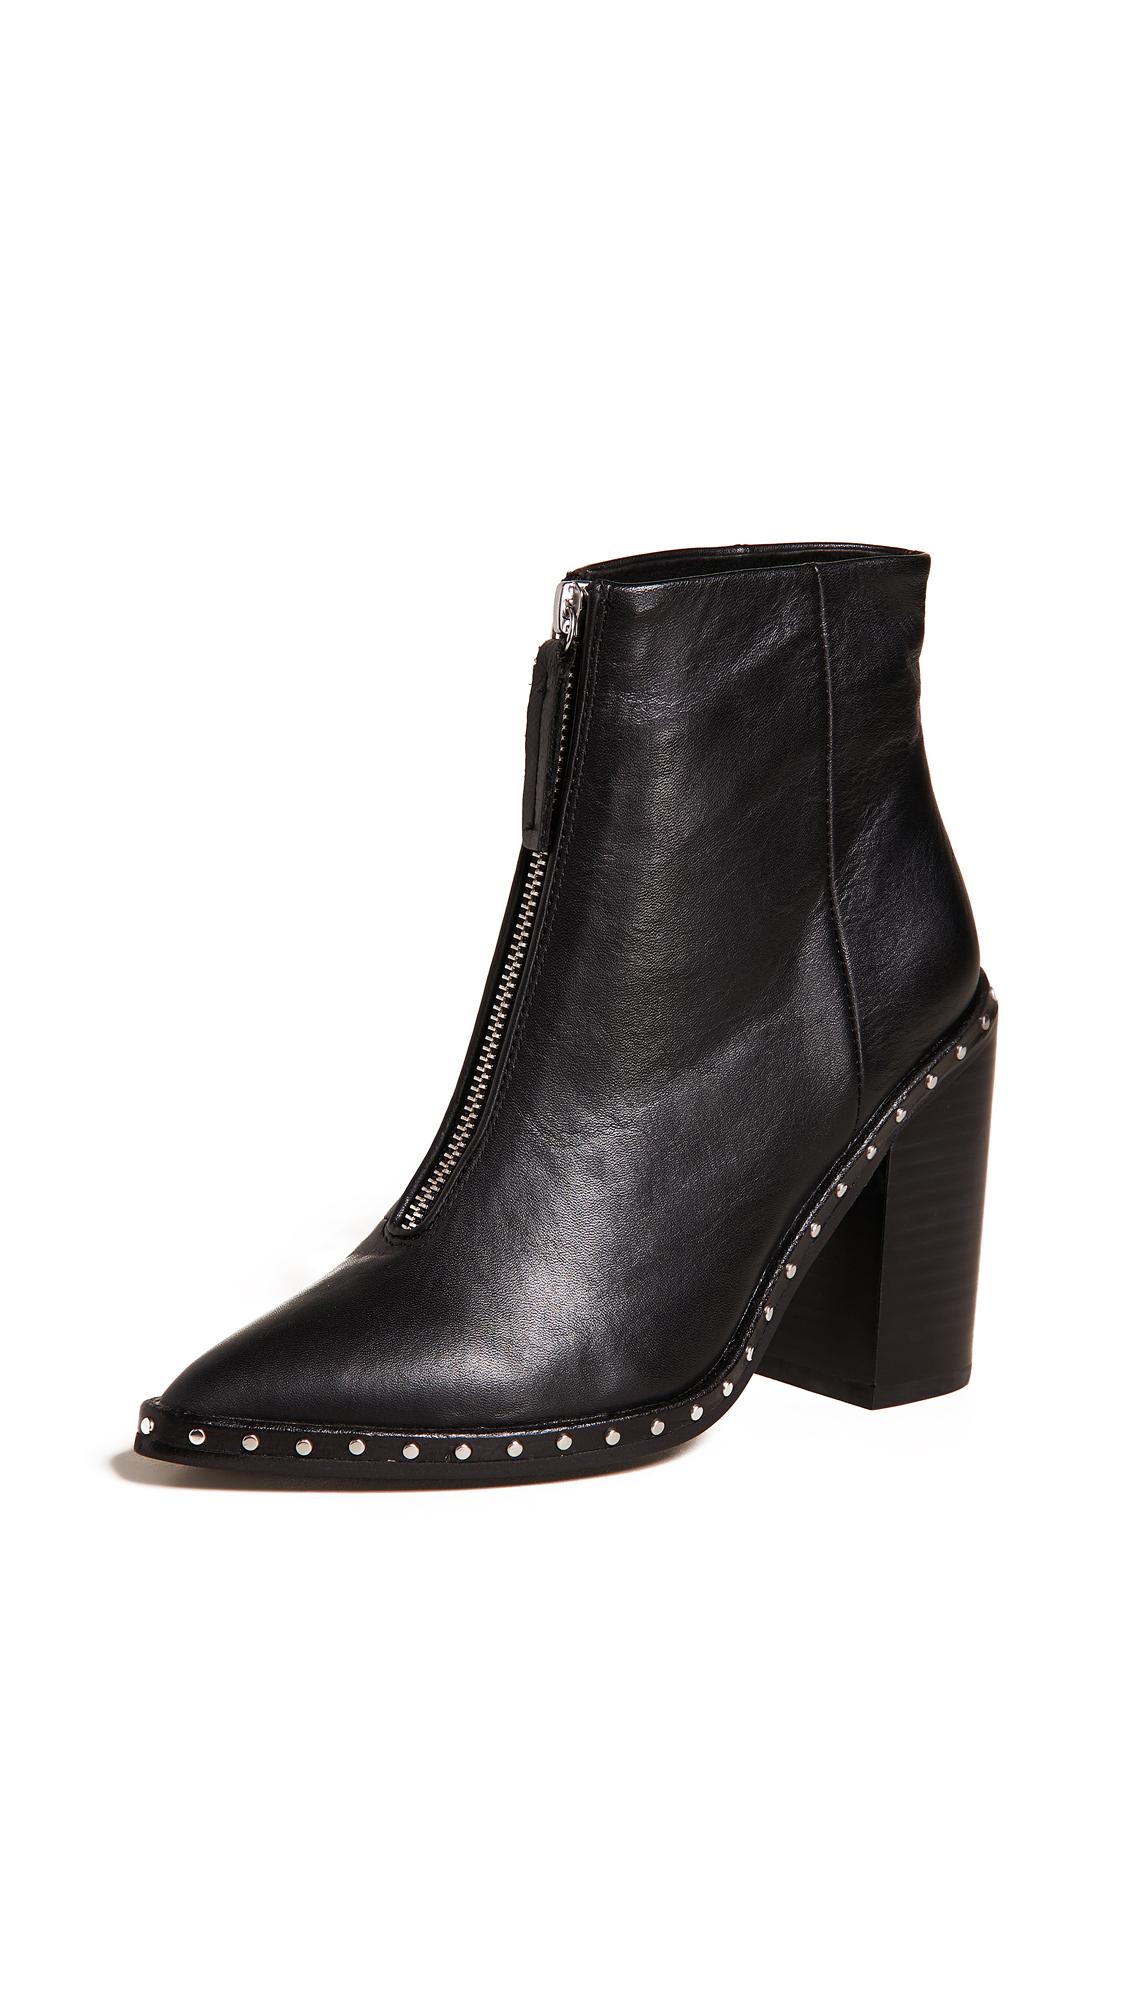 Sol Sana Axel Block Heel Boots - Black